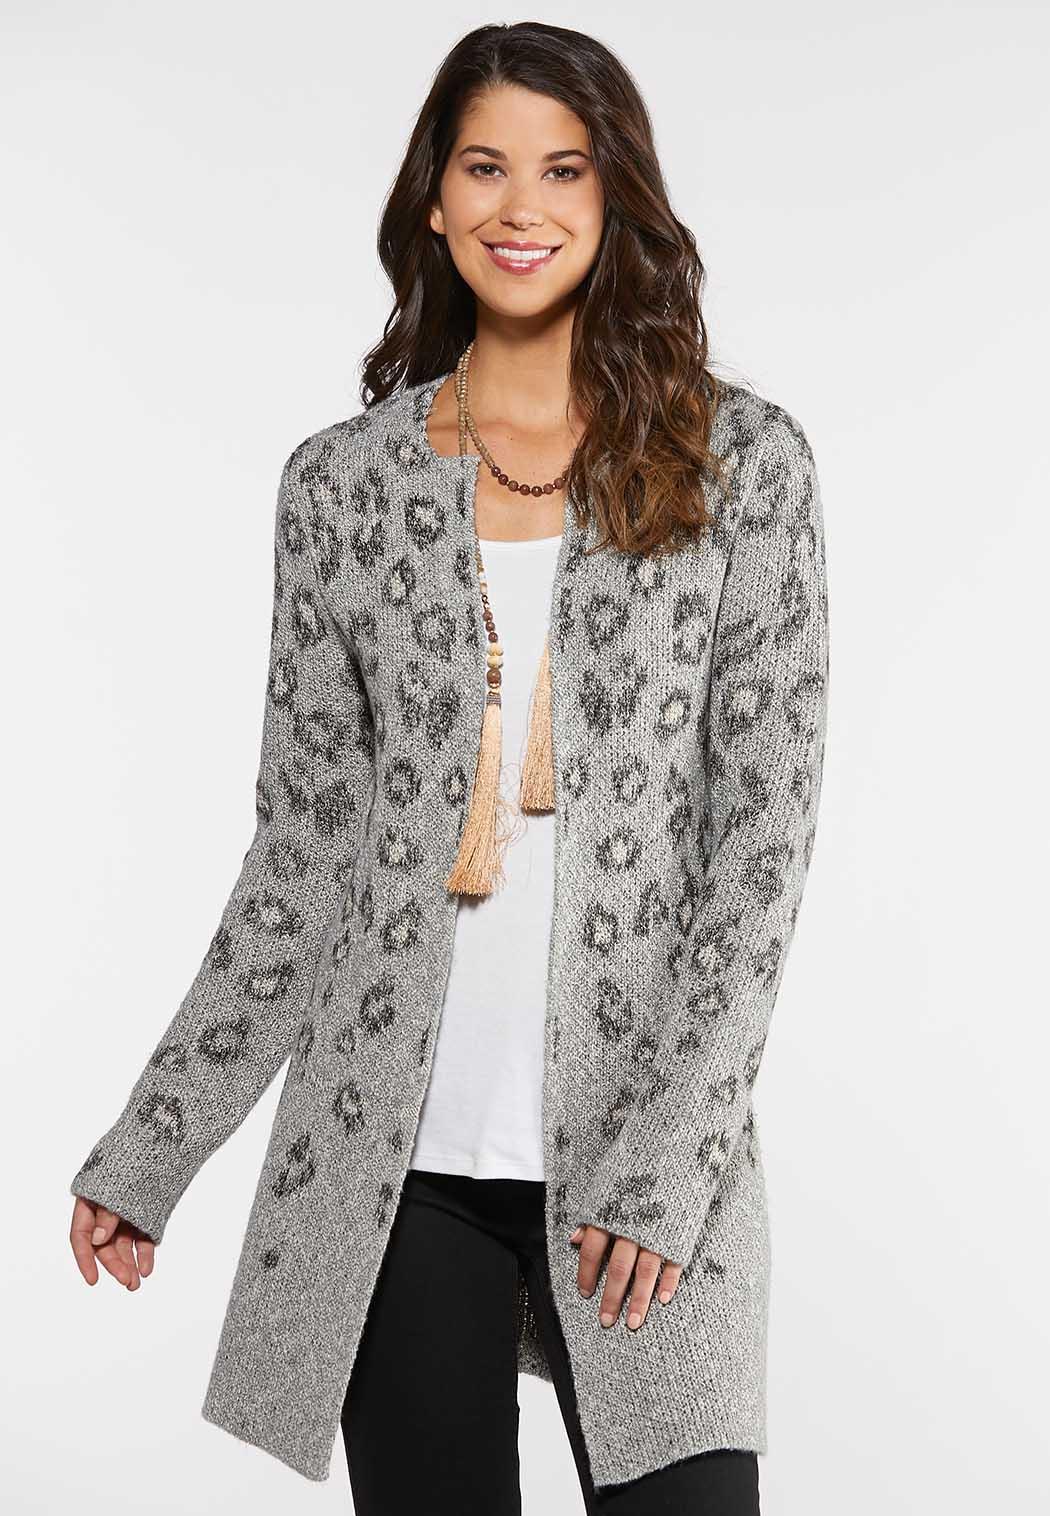 Plus Size Leopard Duster Cardigan Cardigans & Amp ; Shrugs Cato Fashions